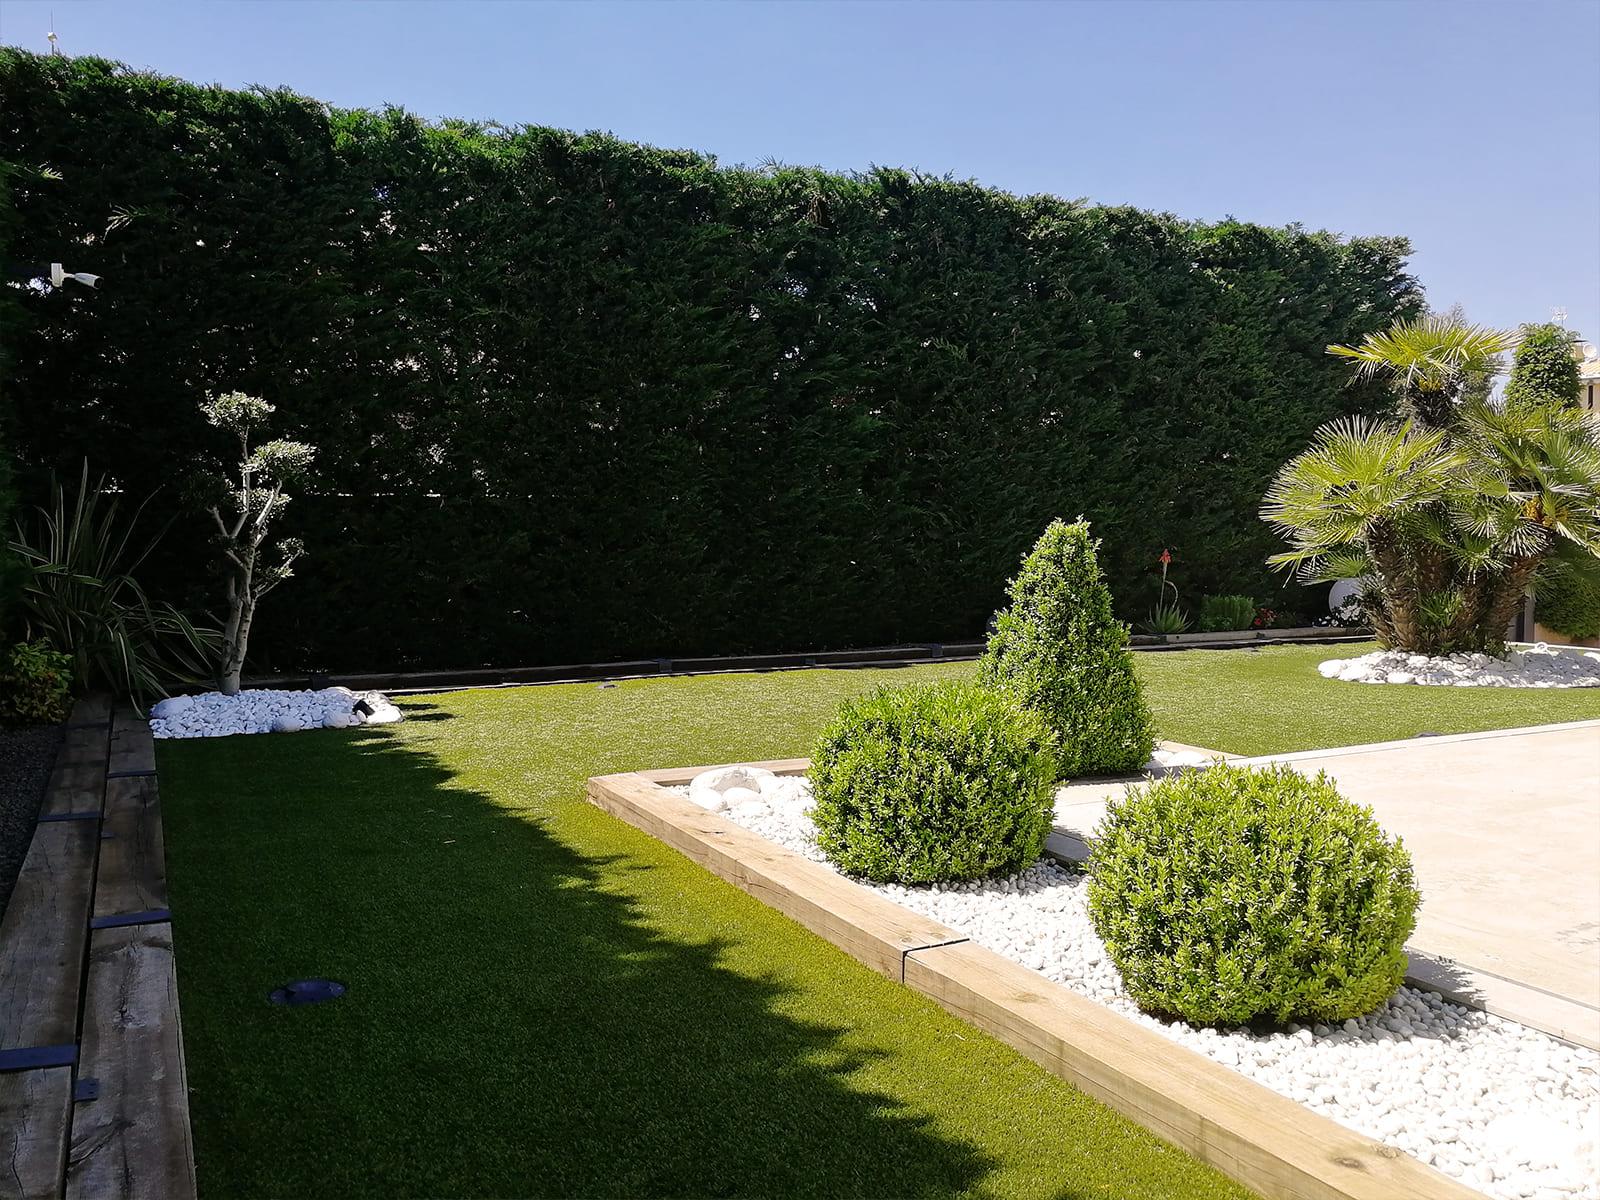 diseño-jardines-piscina-solarium-madera-IJ-06_HIDROJARDIN-Bañeres.jpg